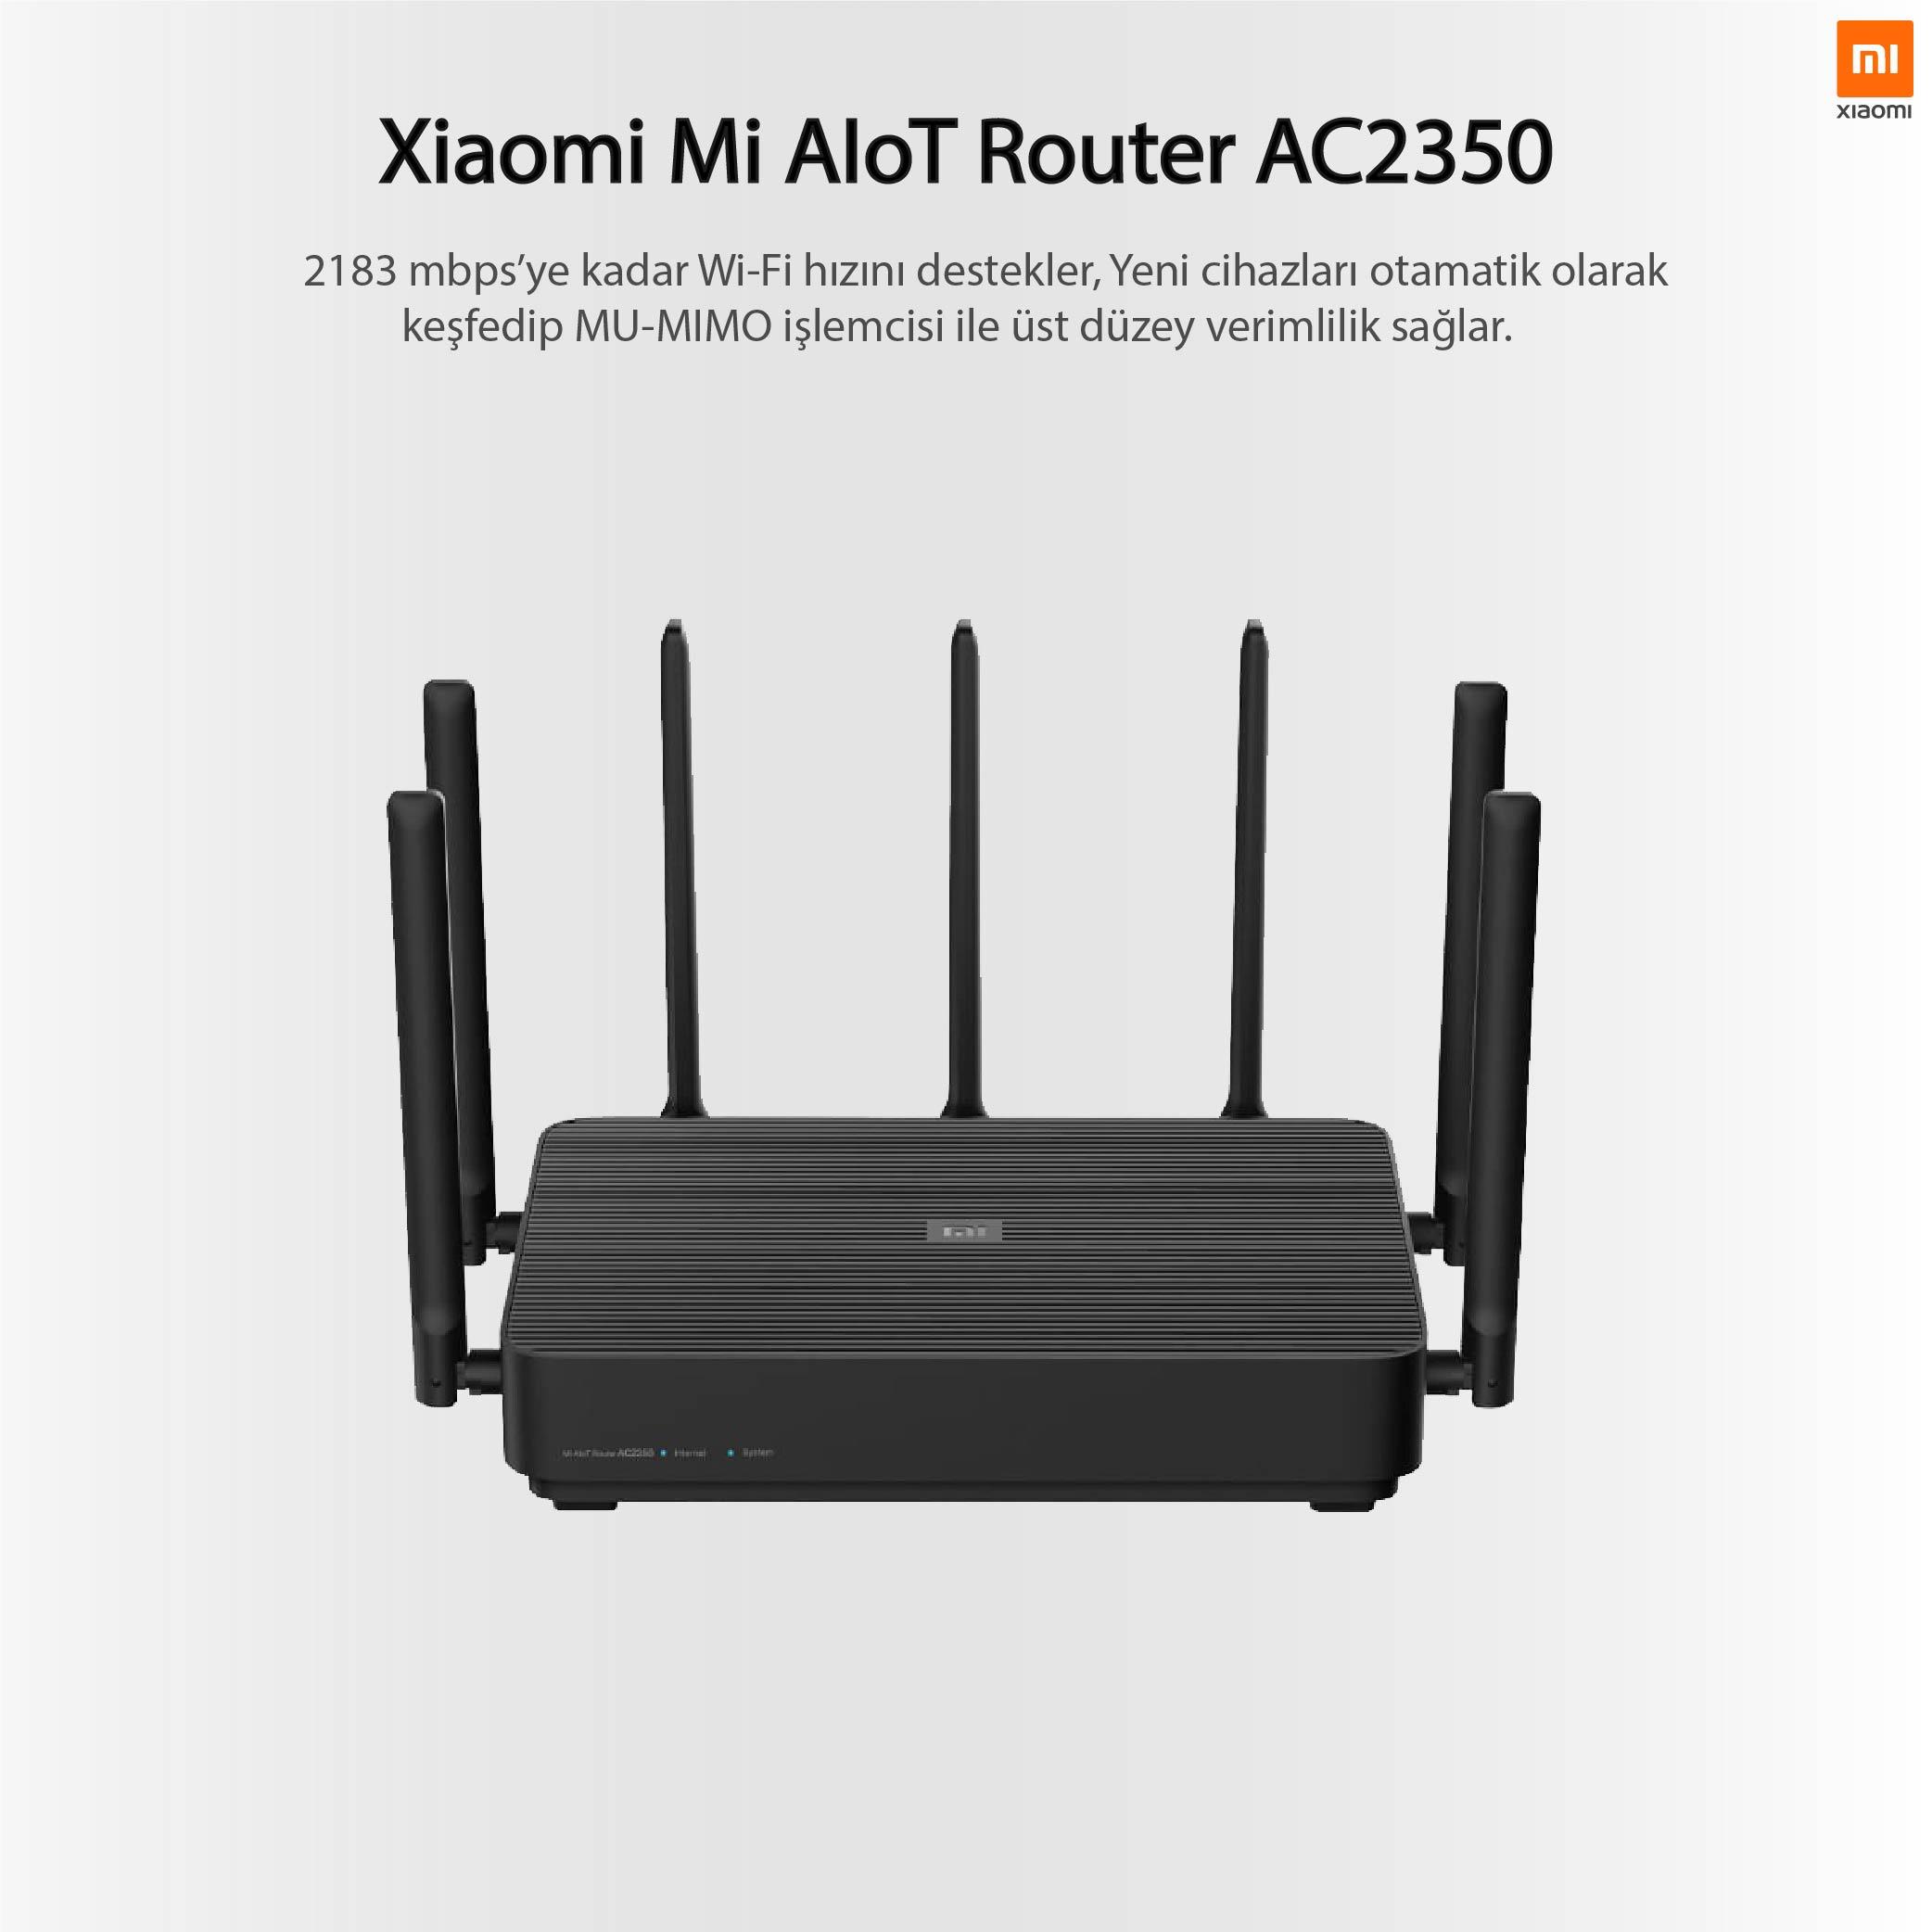 Xiaomi Mi Alot AC2350 Router